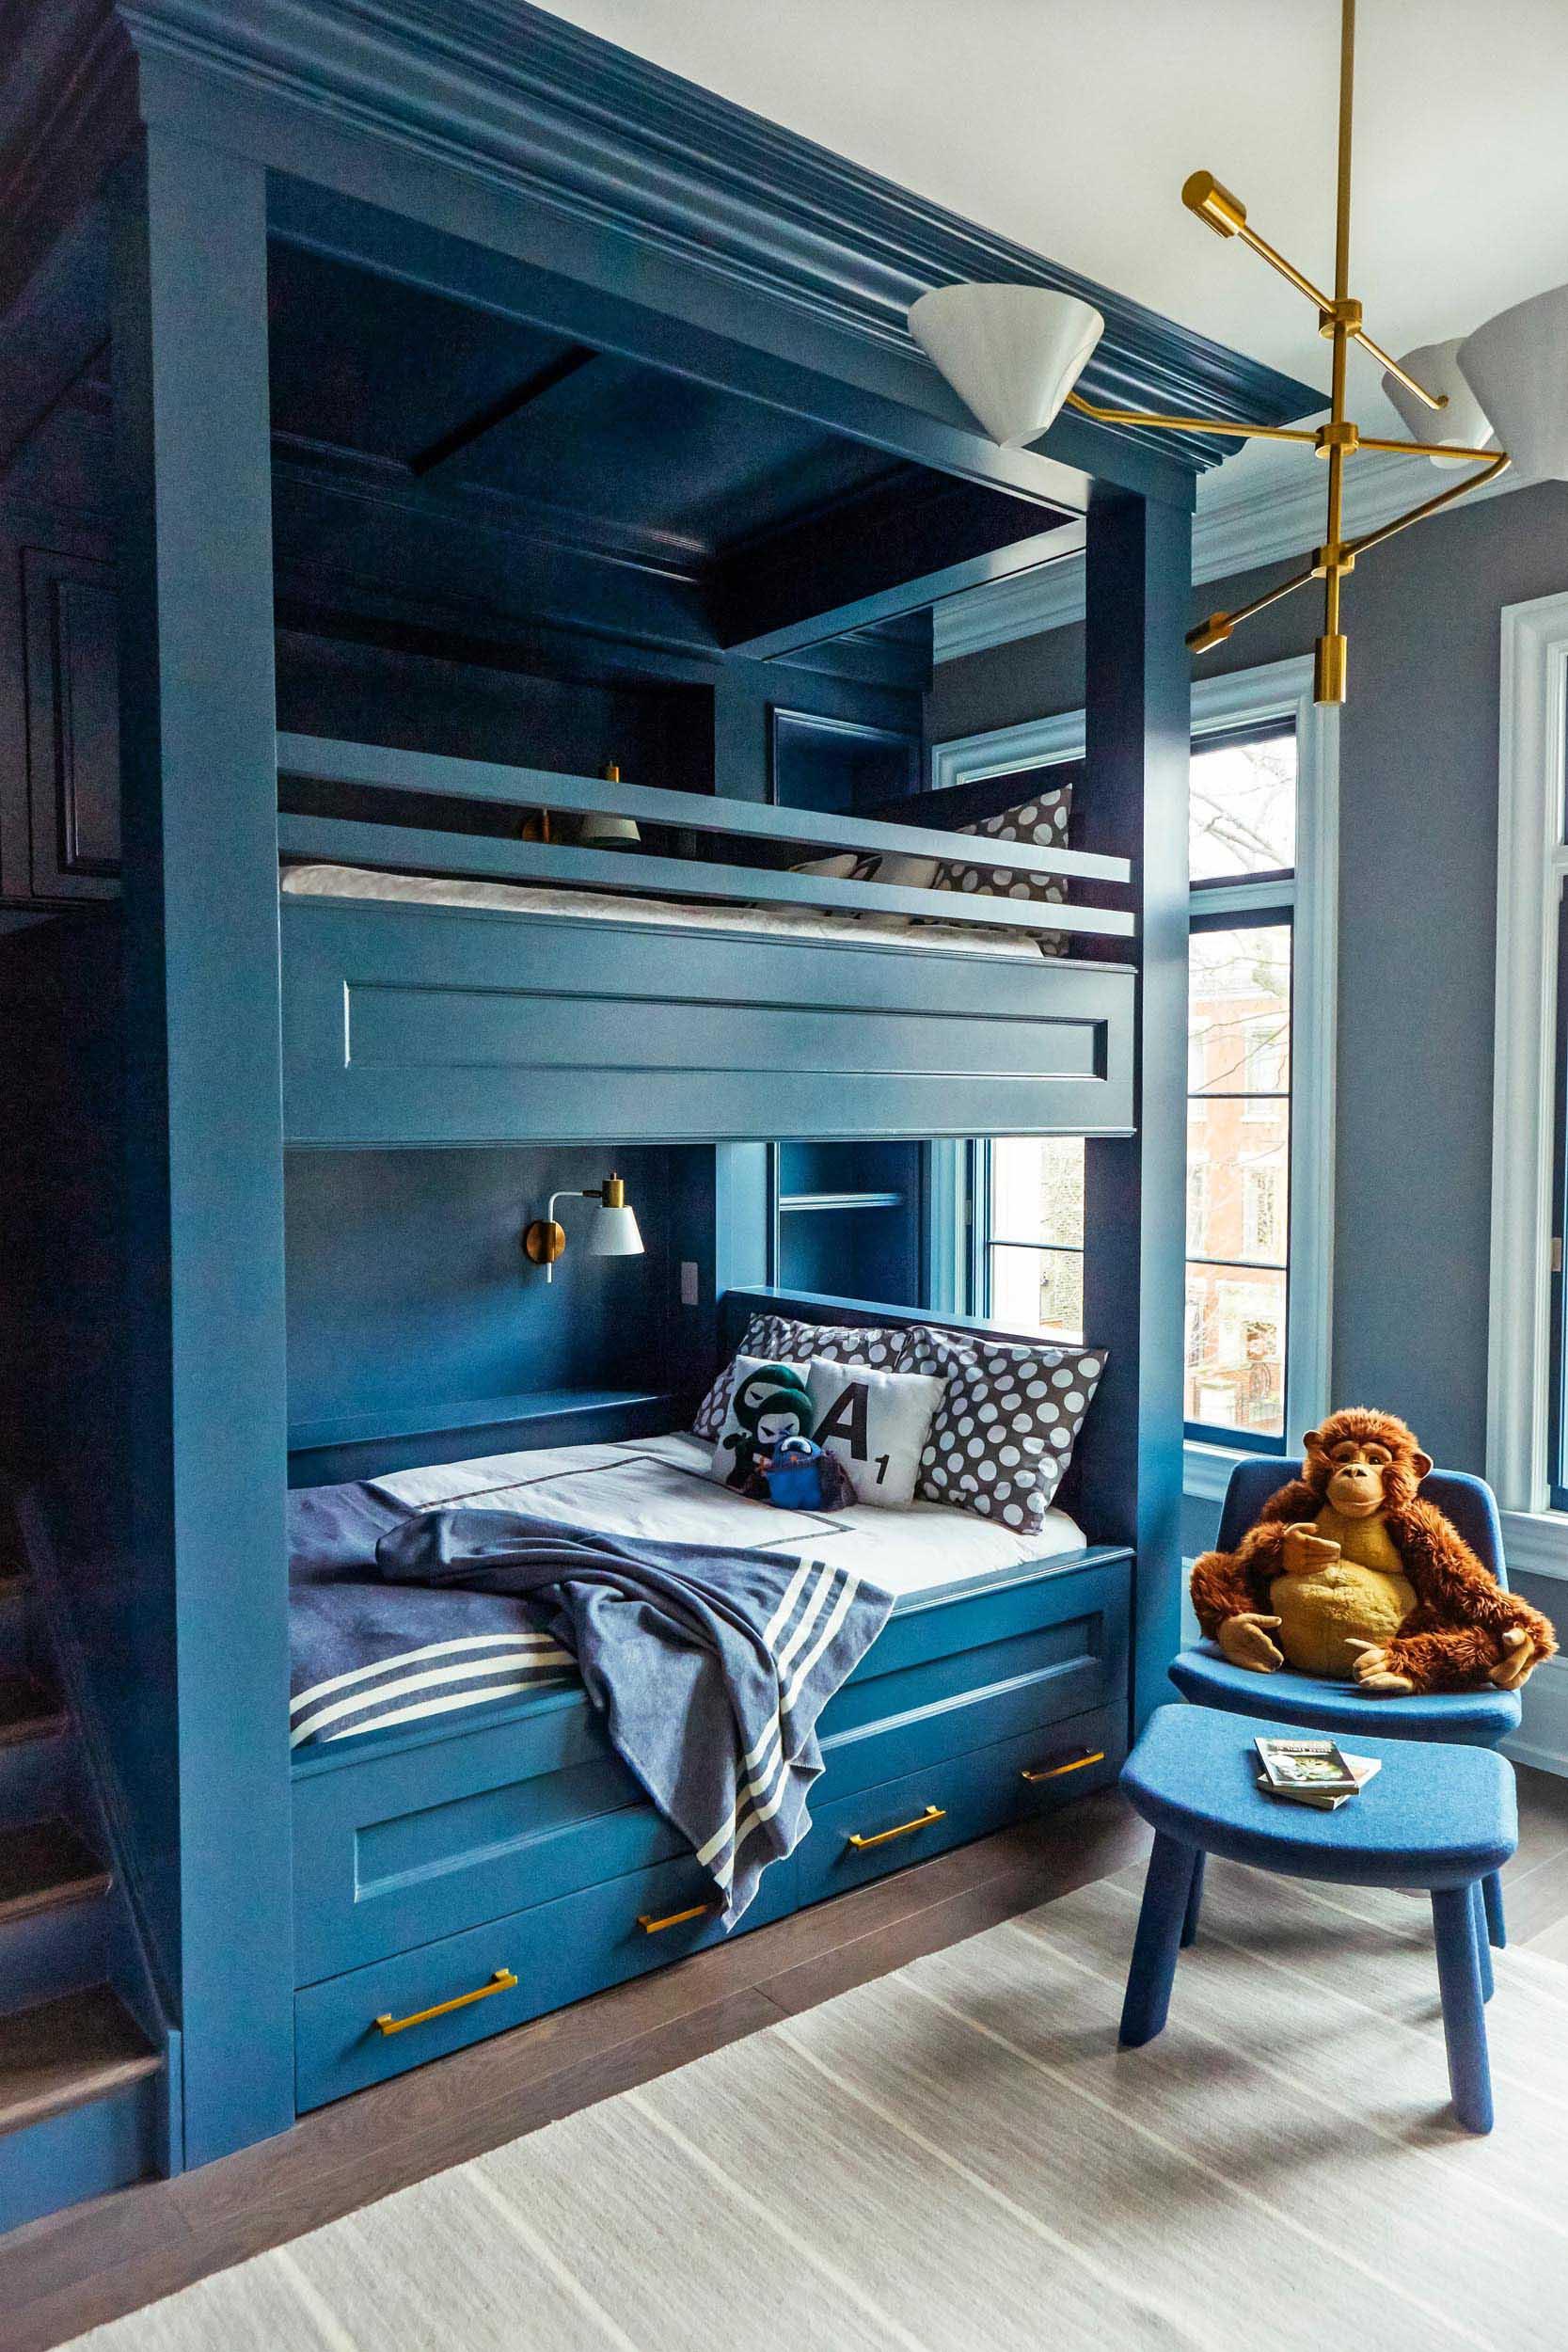 Leo_Designs_Chicago_interior_design_lincoln_park_parisian7.jpg